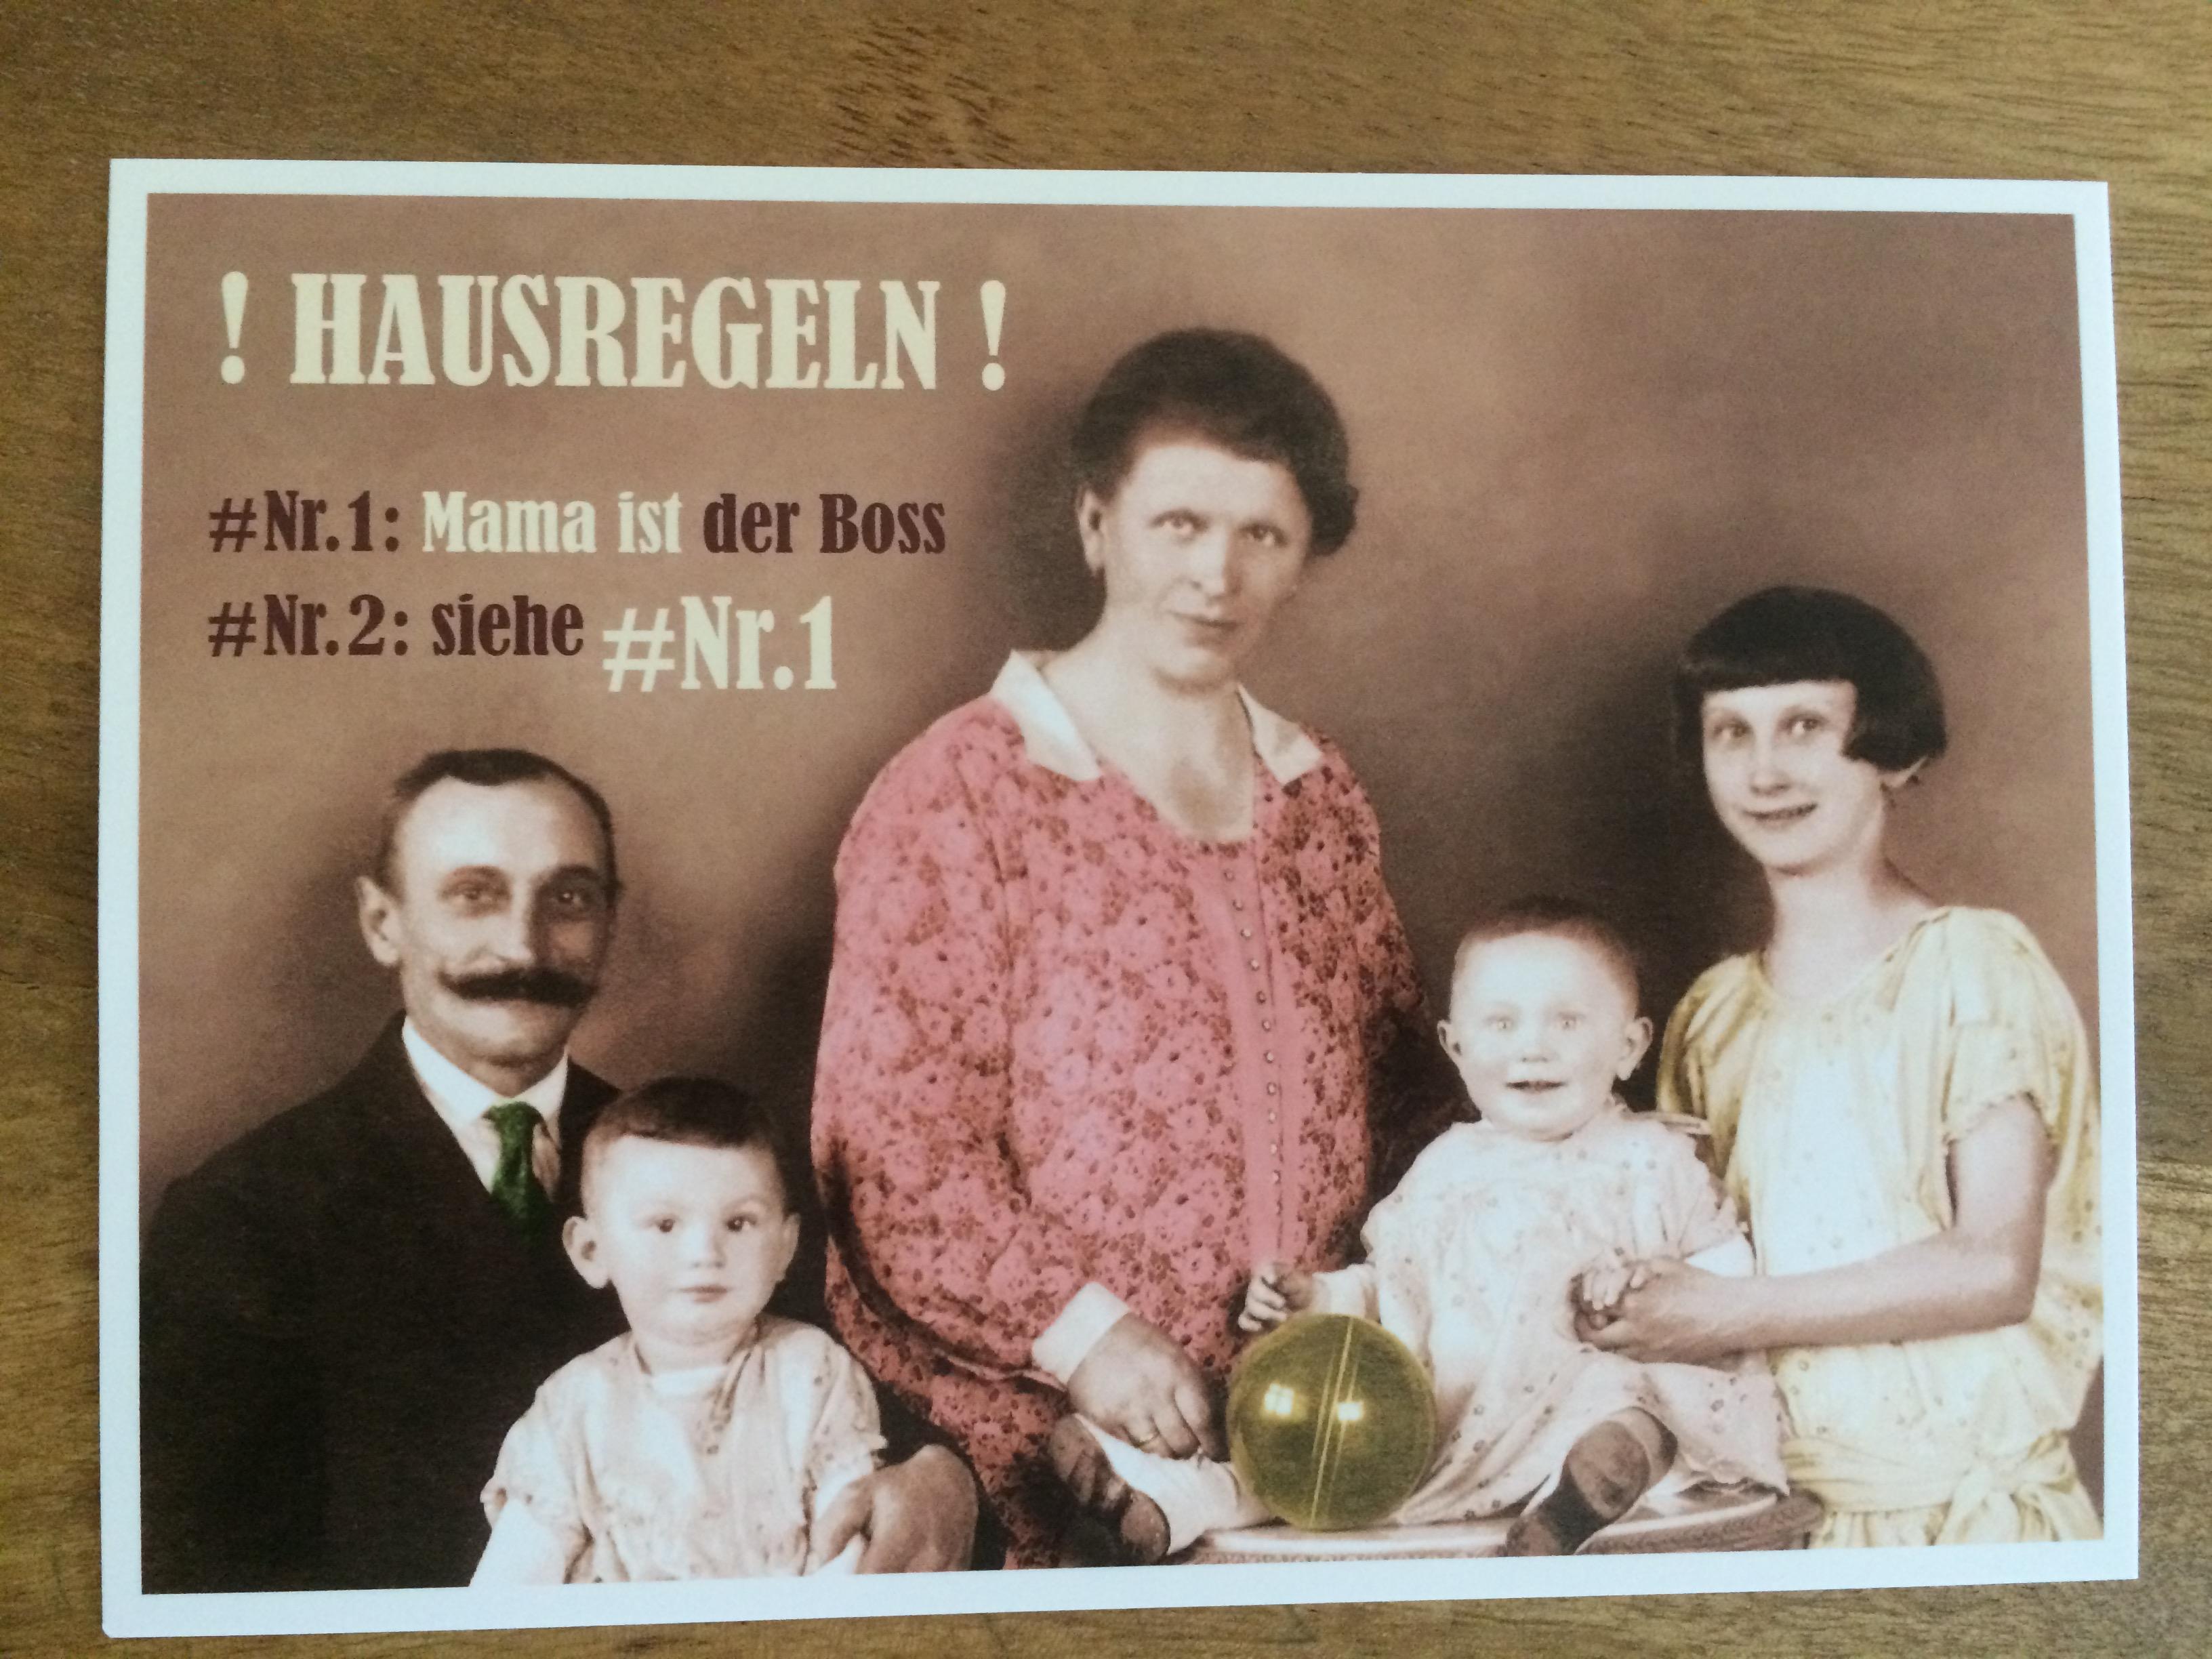 Nützlichgrusskarten - Postkarte Karte Hausregeln Nr. 1 Mama ist der Boss Nr. 2 siehe Nr. 1 Paloma - Onlineshop Tante Emmer